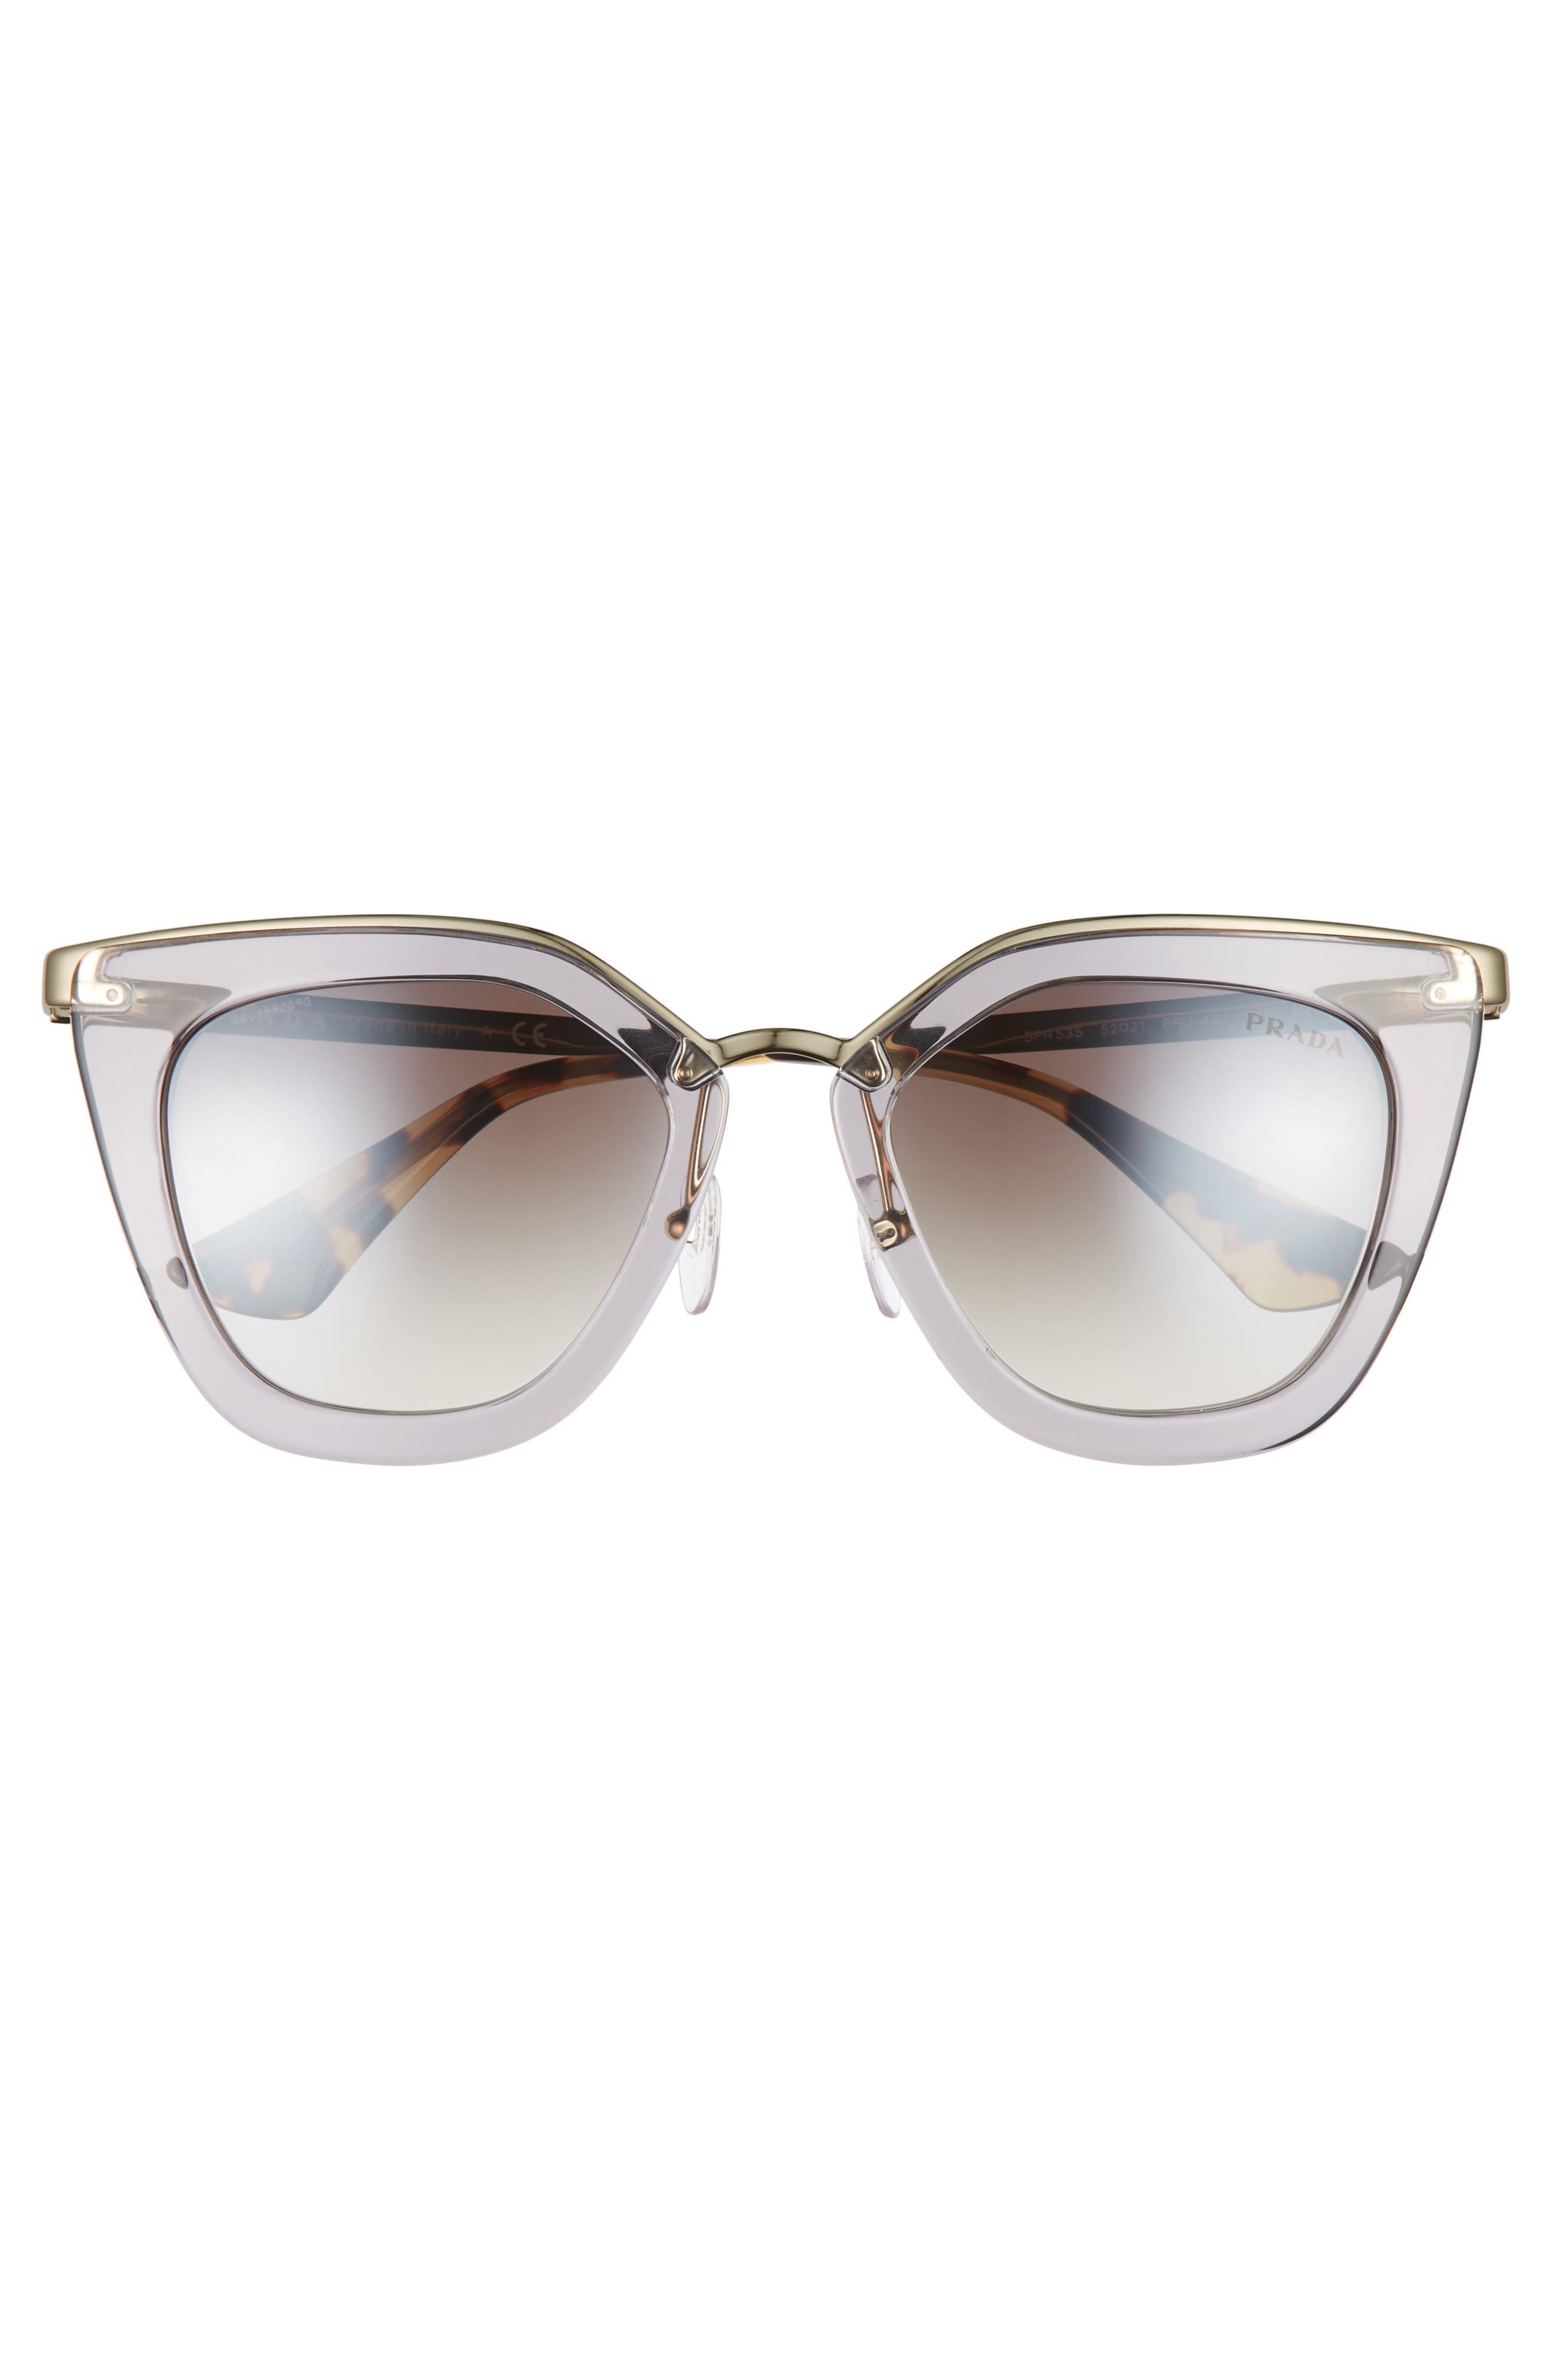 52mm Gradient Cat Eye Sunglasses,                             Alternate thumbnail 3, color,                             Transparent Grey